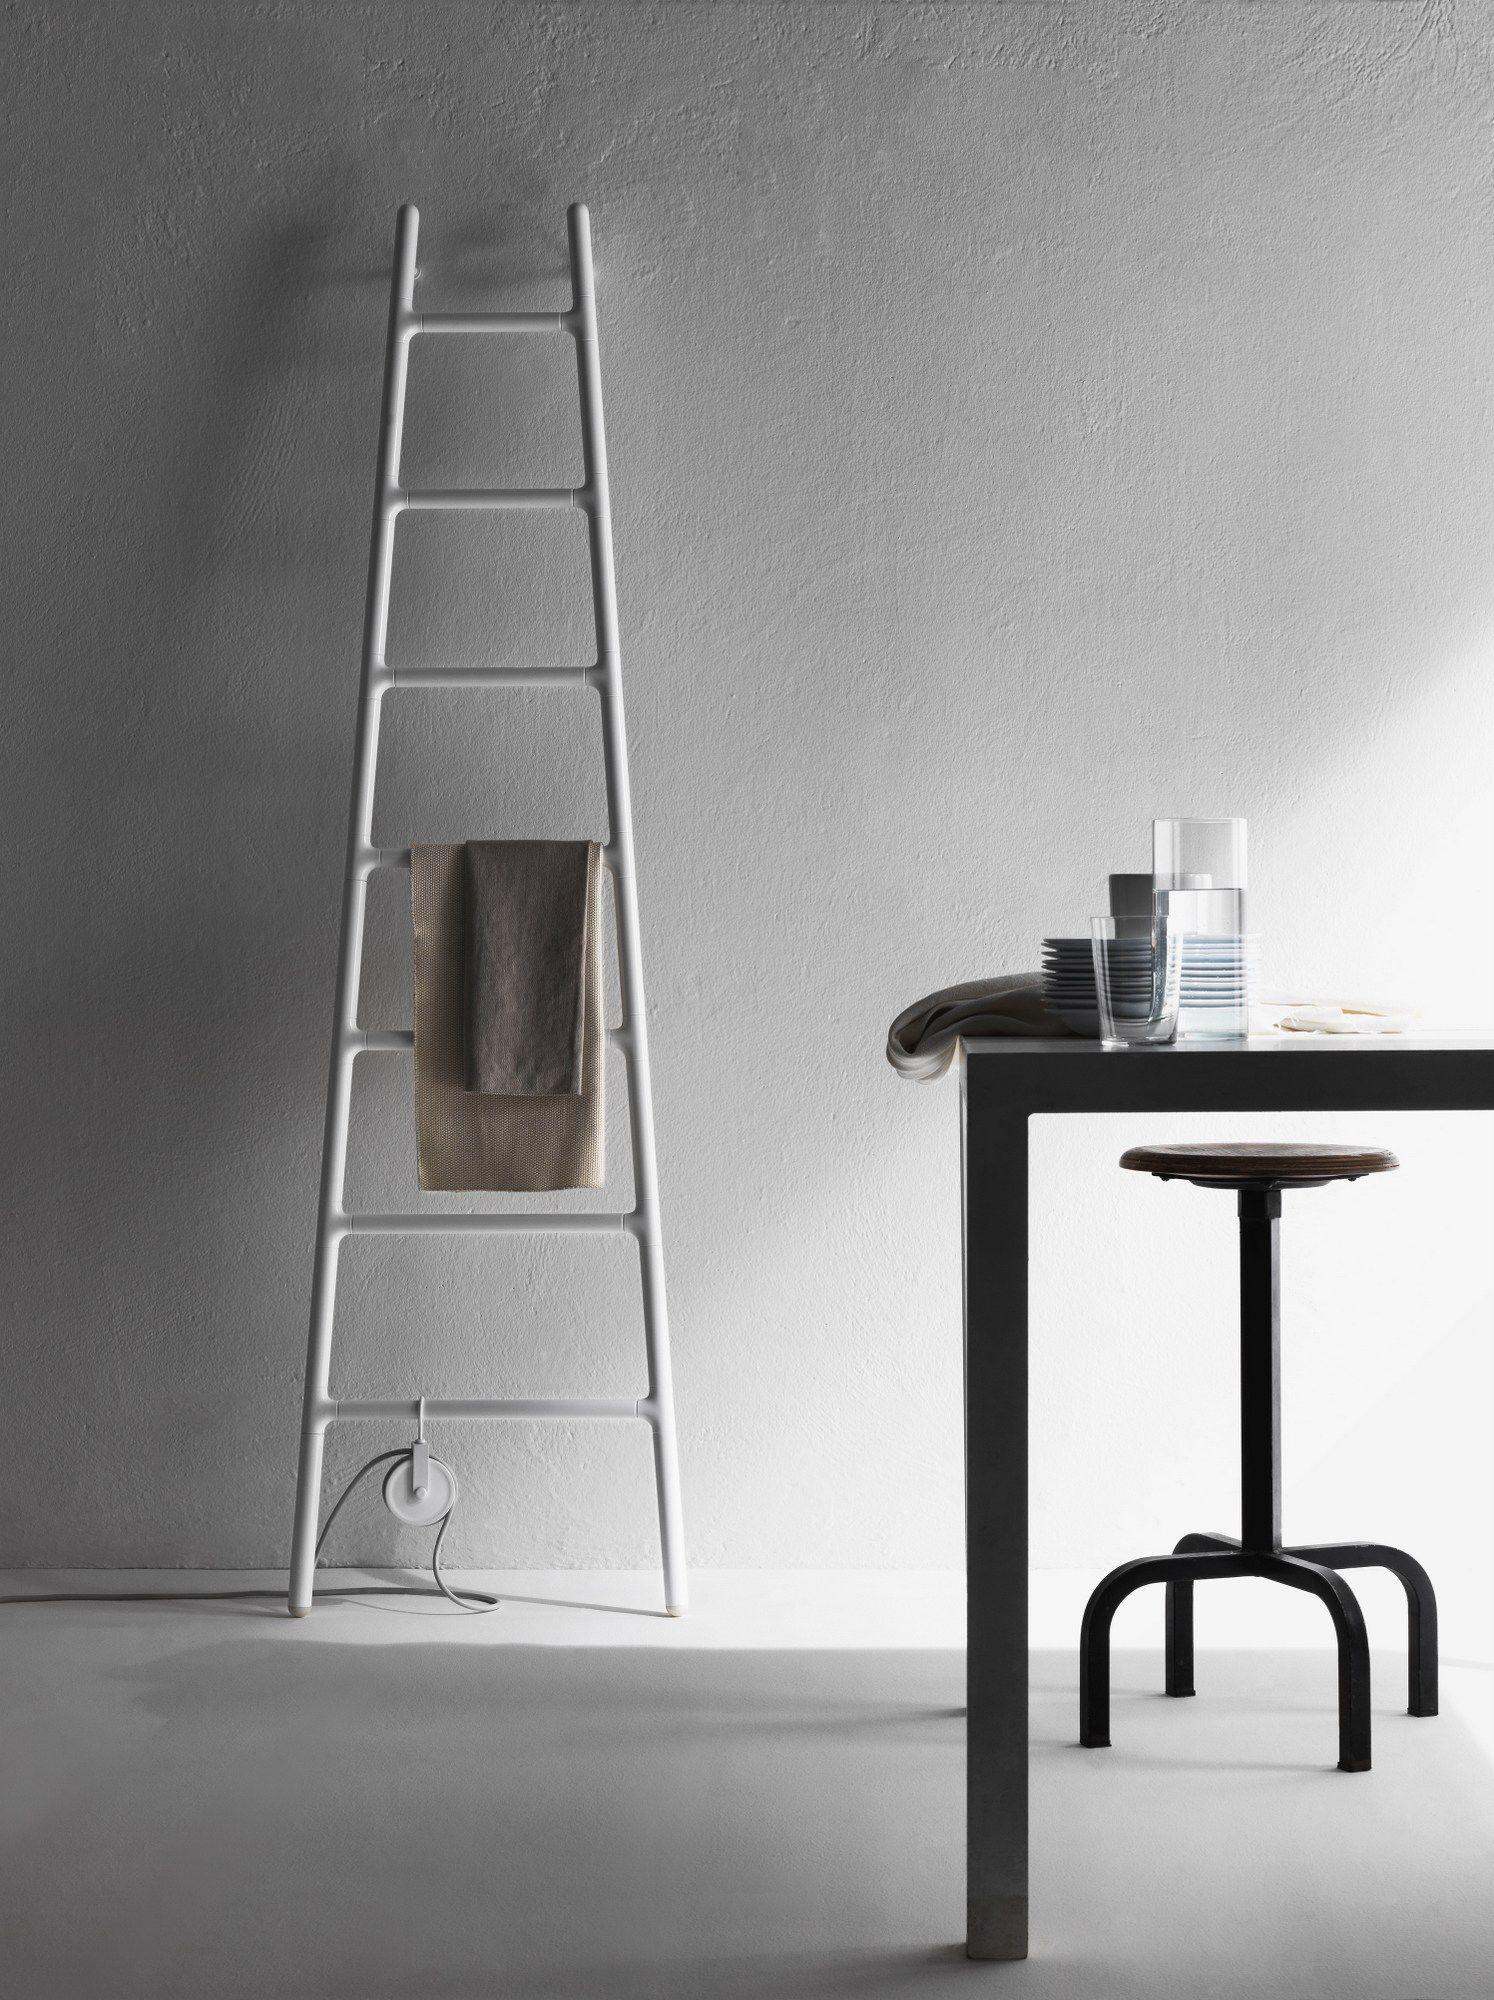 scaletta wandmontierter heizk rper by tubes radiatori design elisa gargan giovannoni. Black Bedroom Furniture Sets. Home Design Ideas